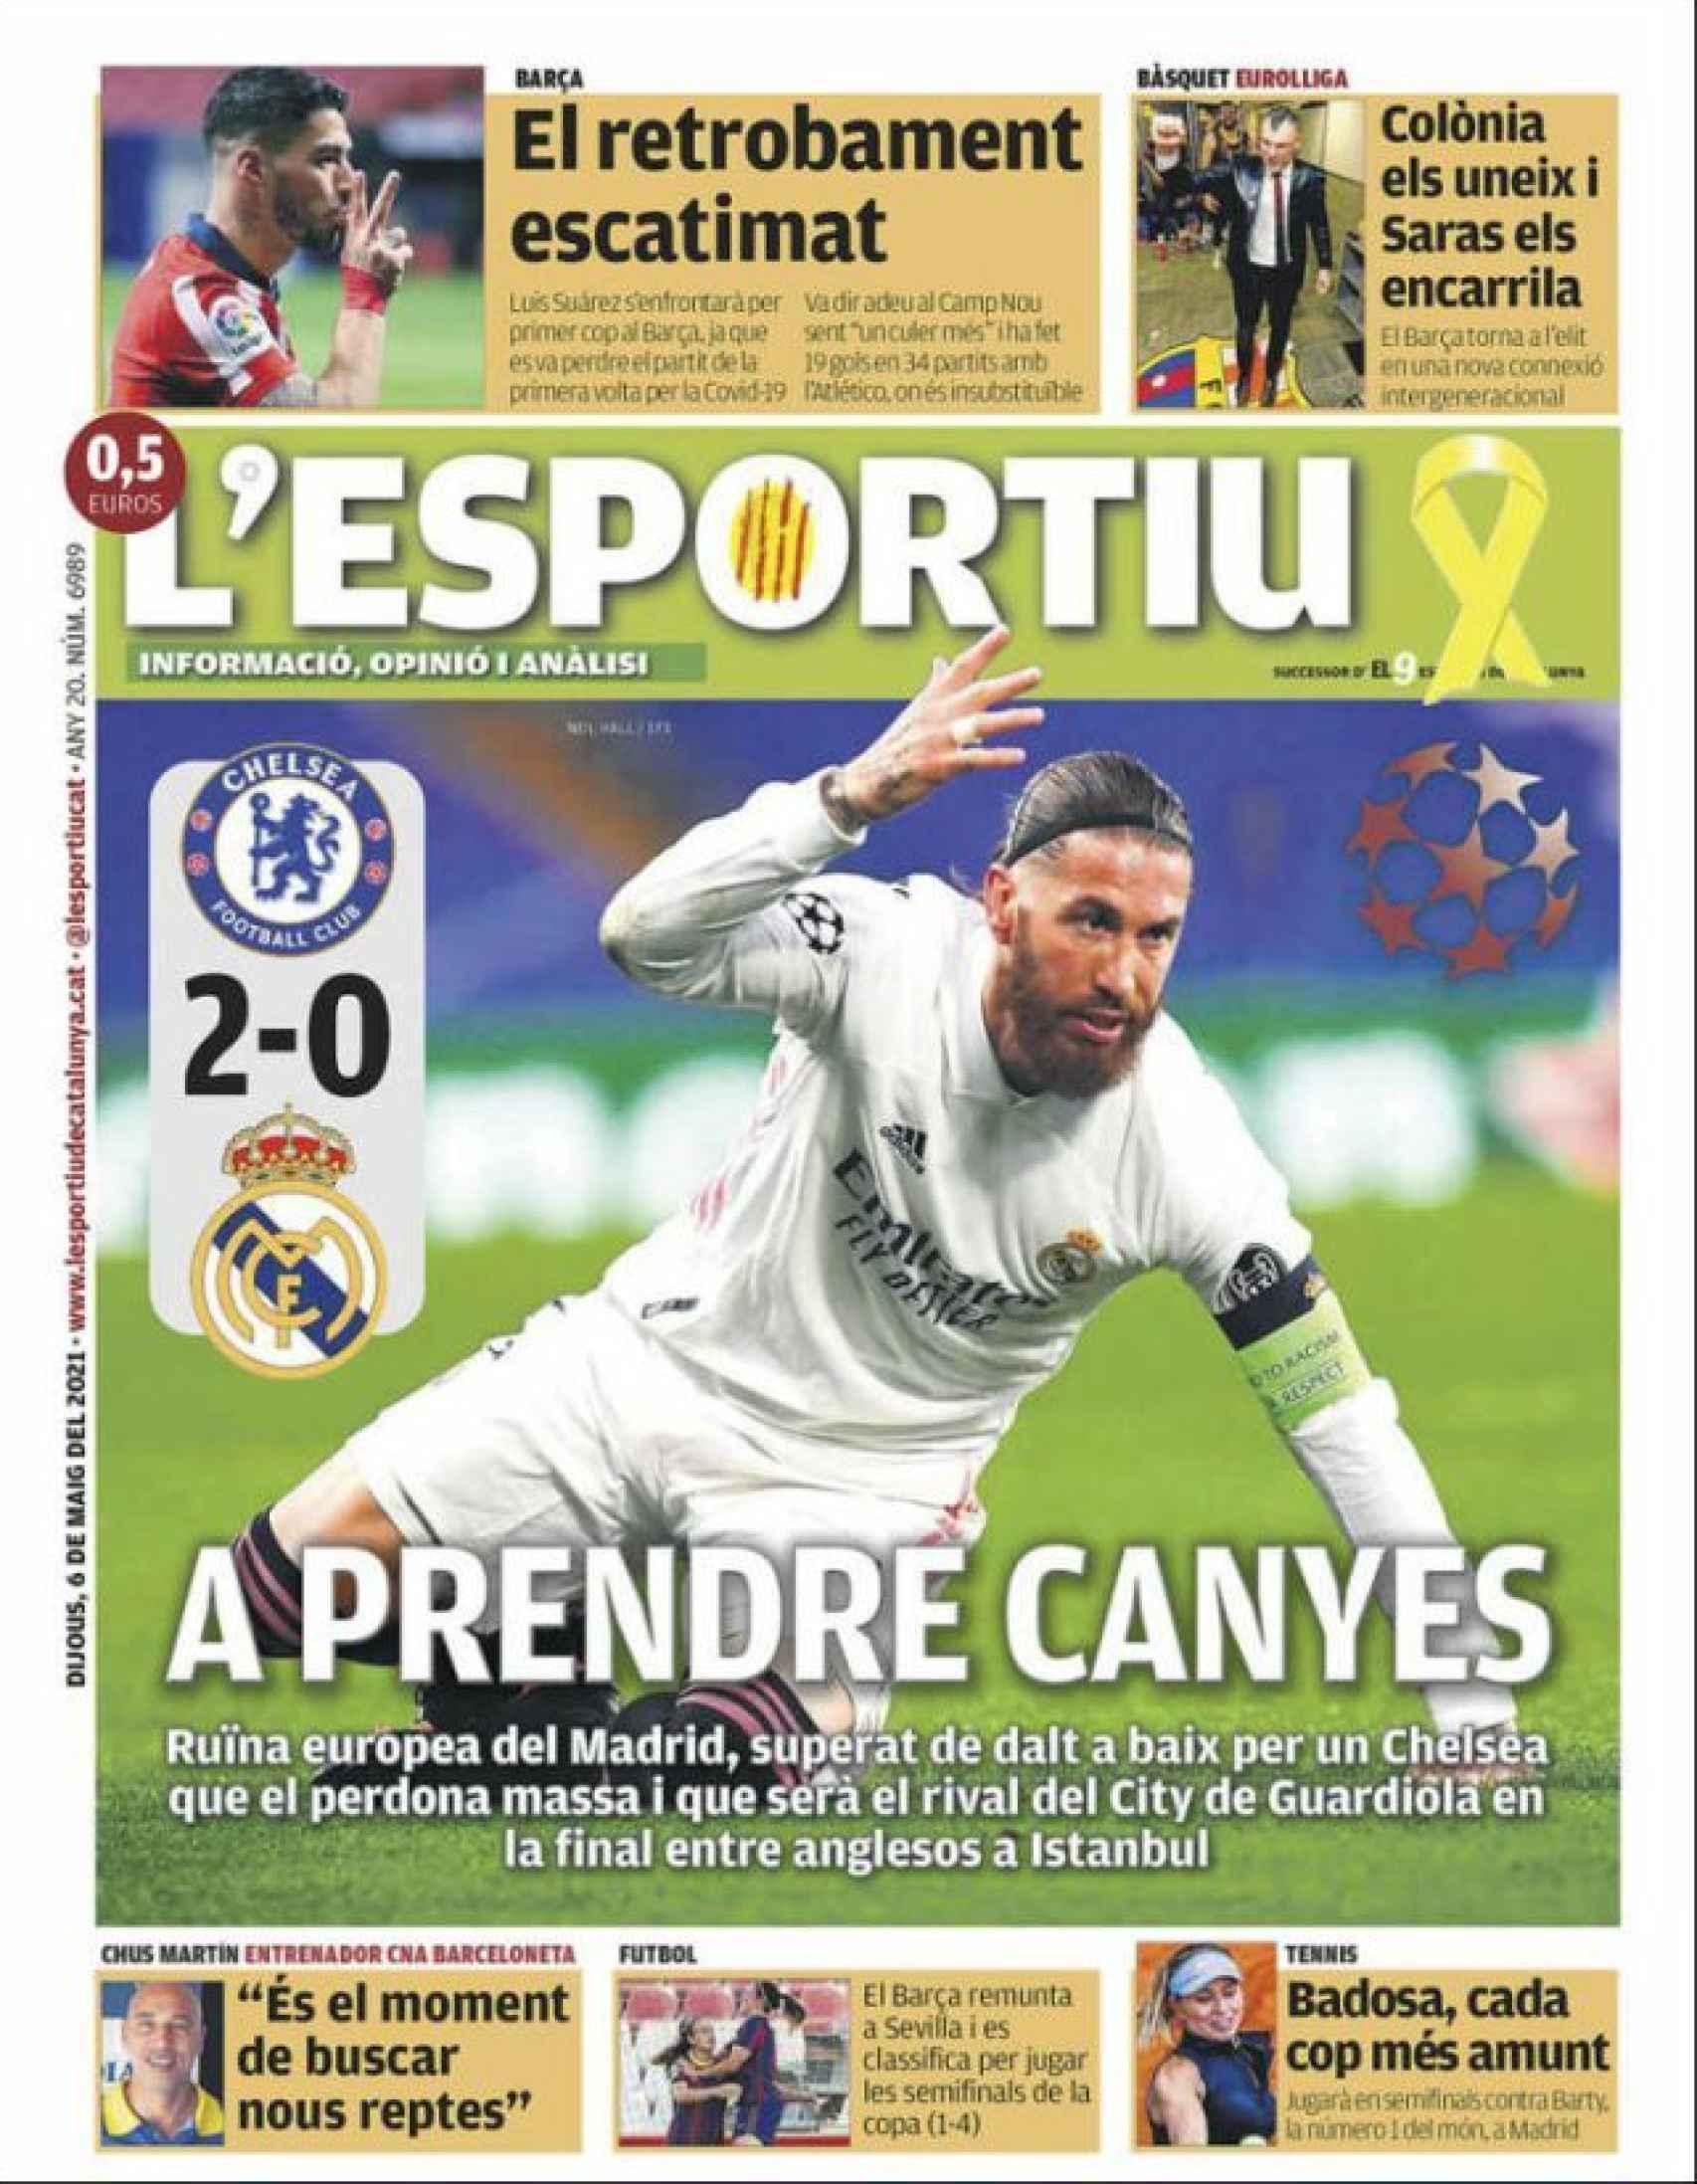 La portada del diario L'Esportiu